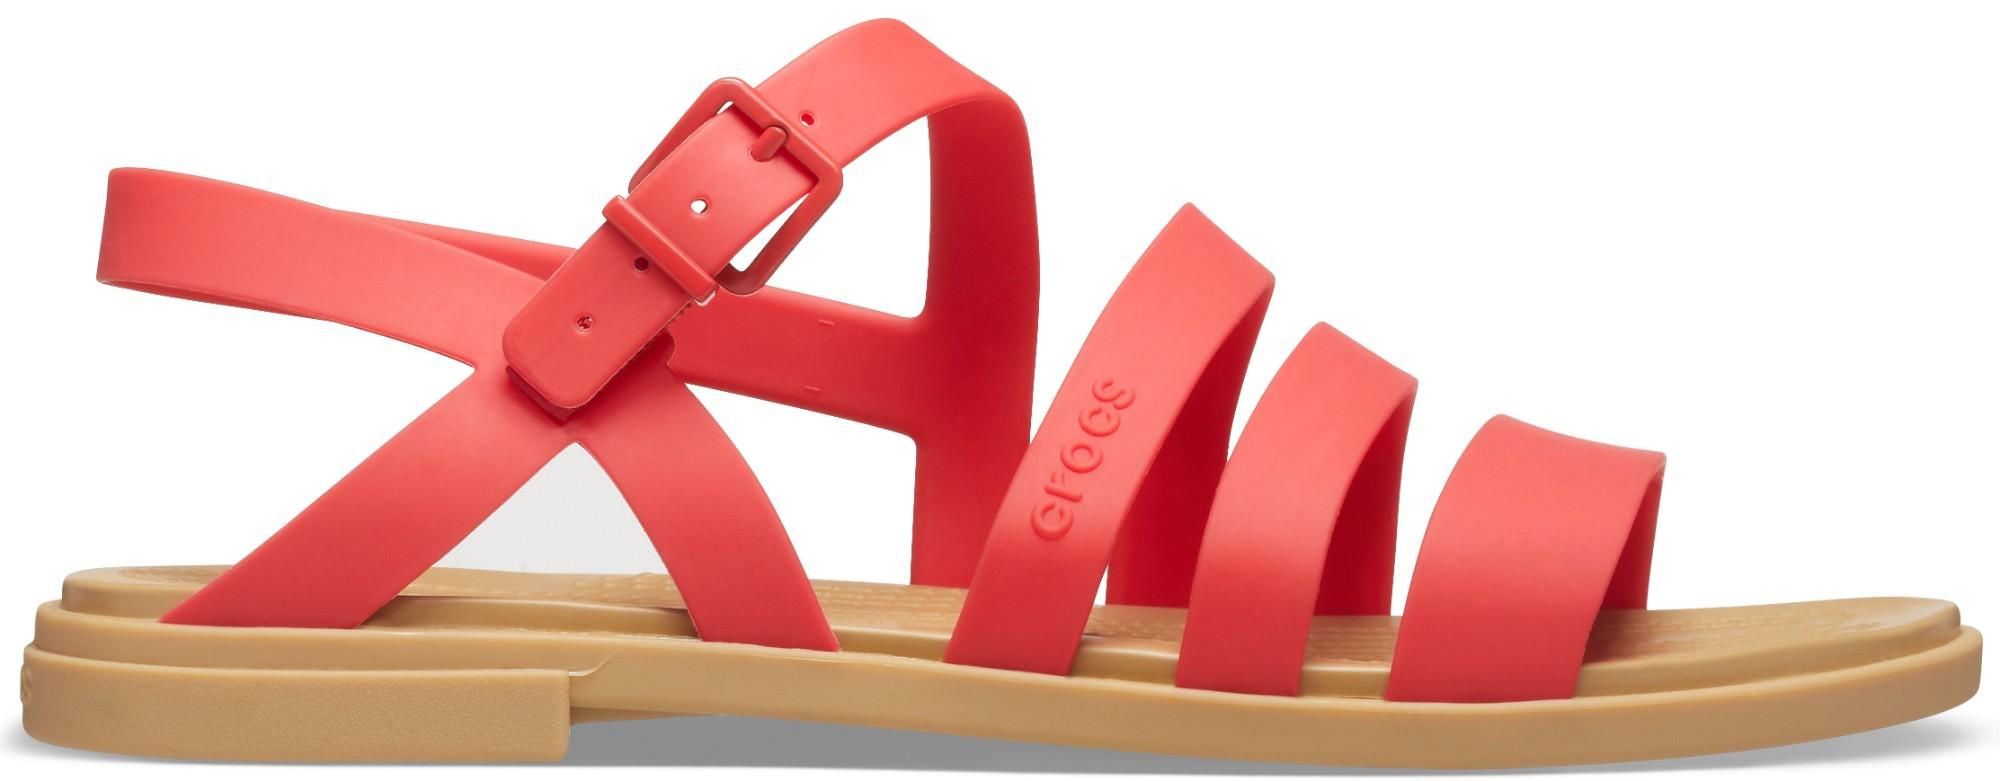 Crocs™ Tulum Sandal Womens Flame 42,5